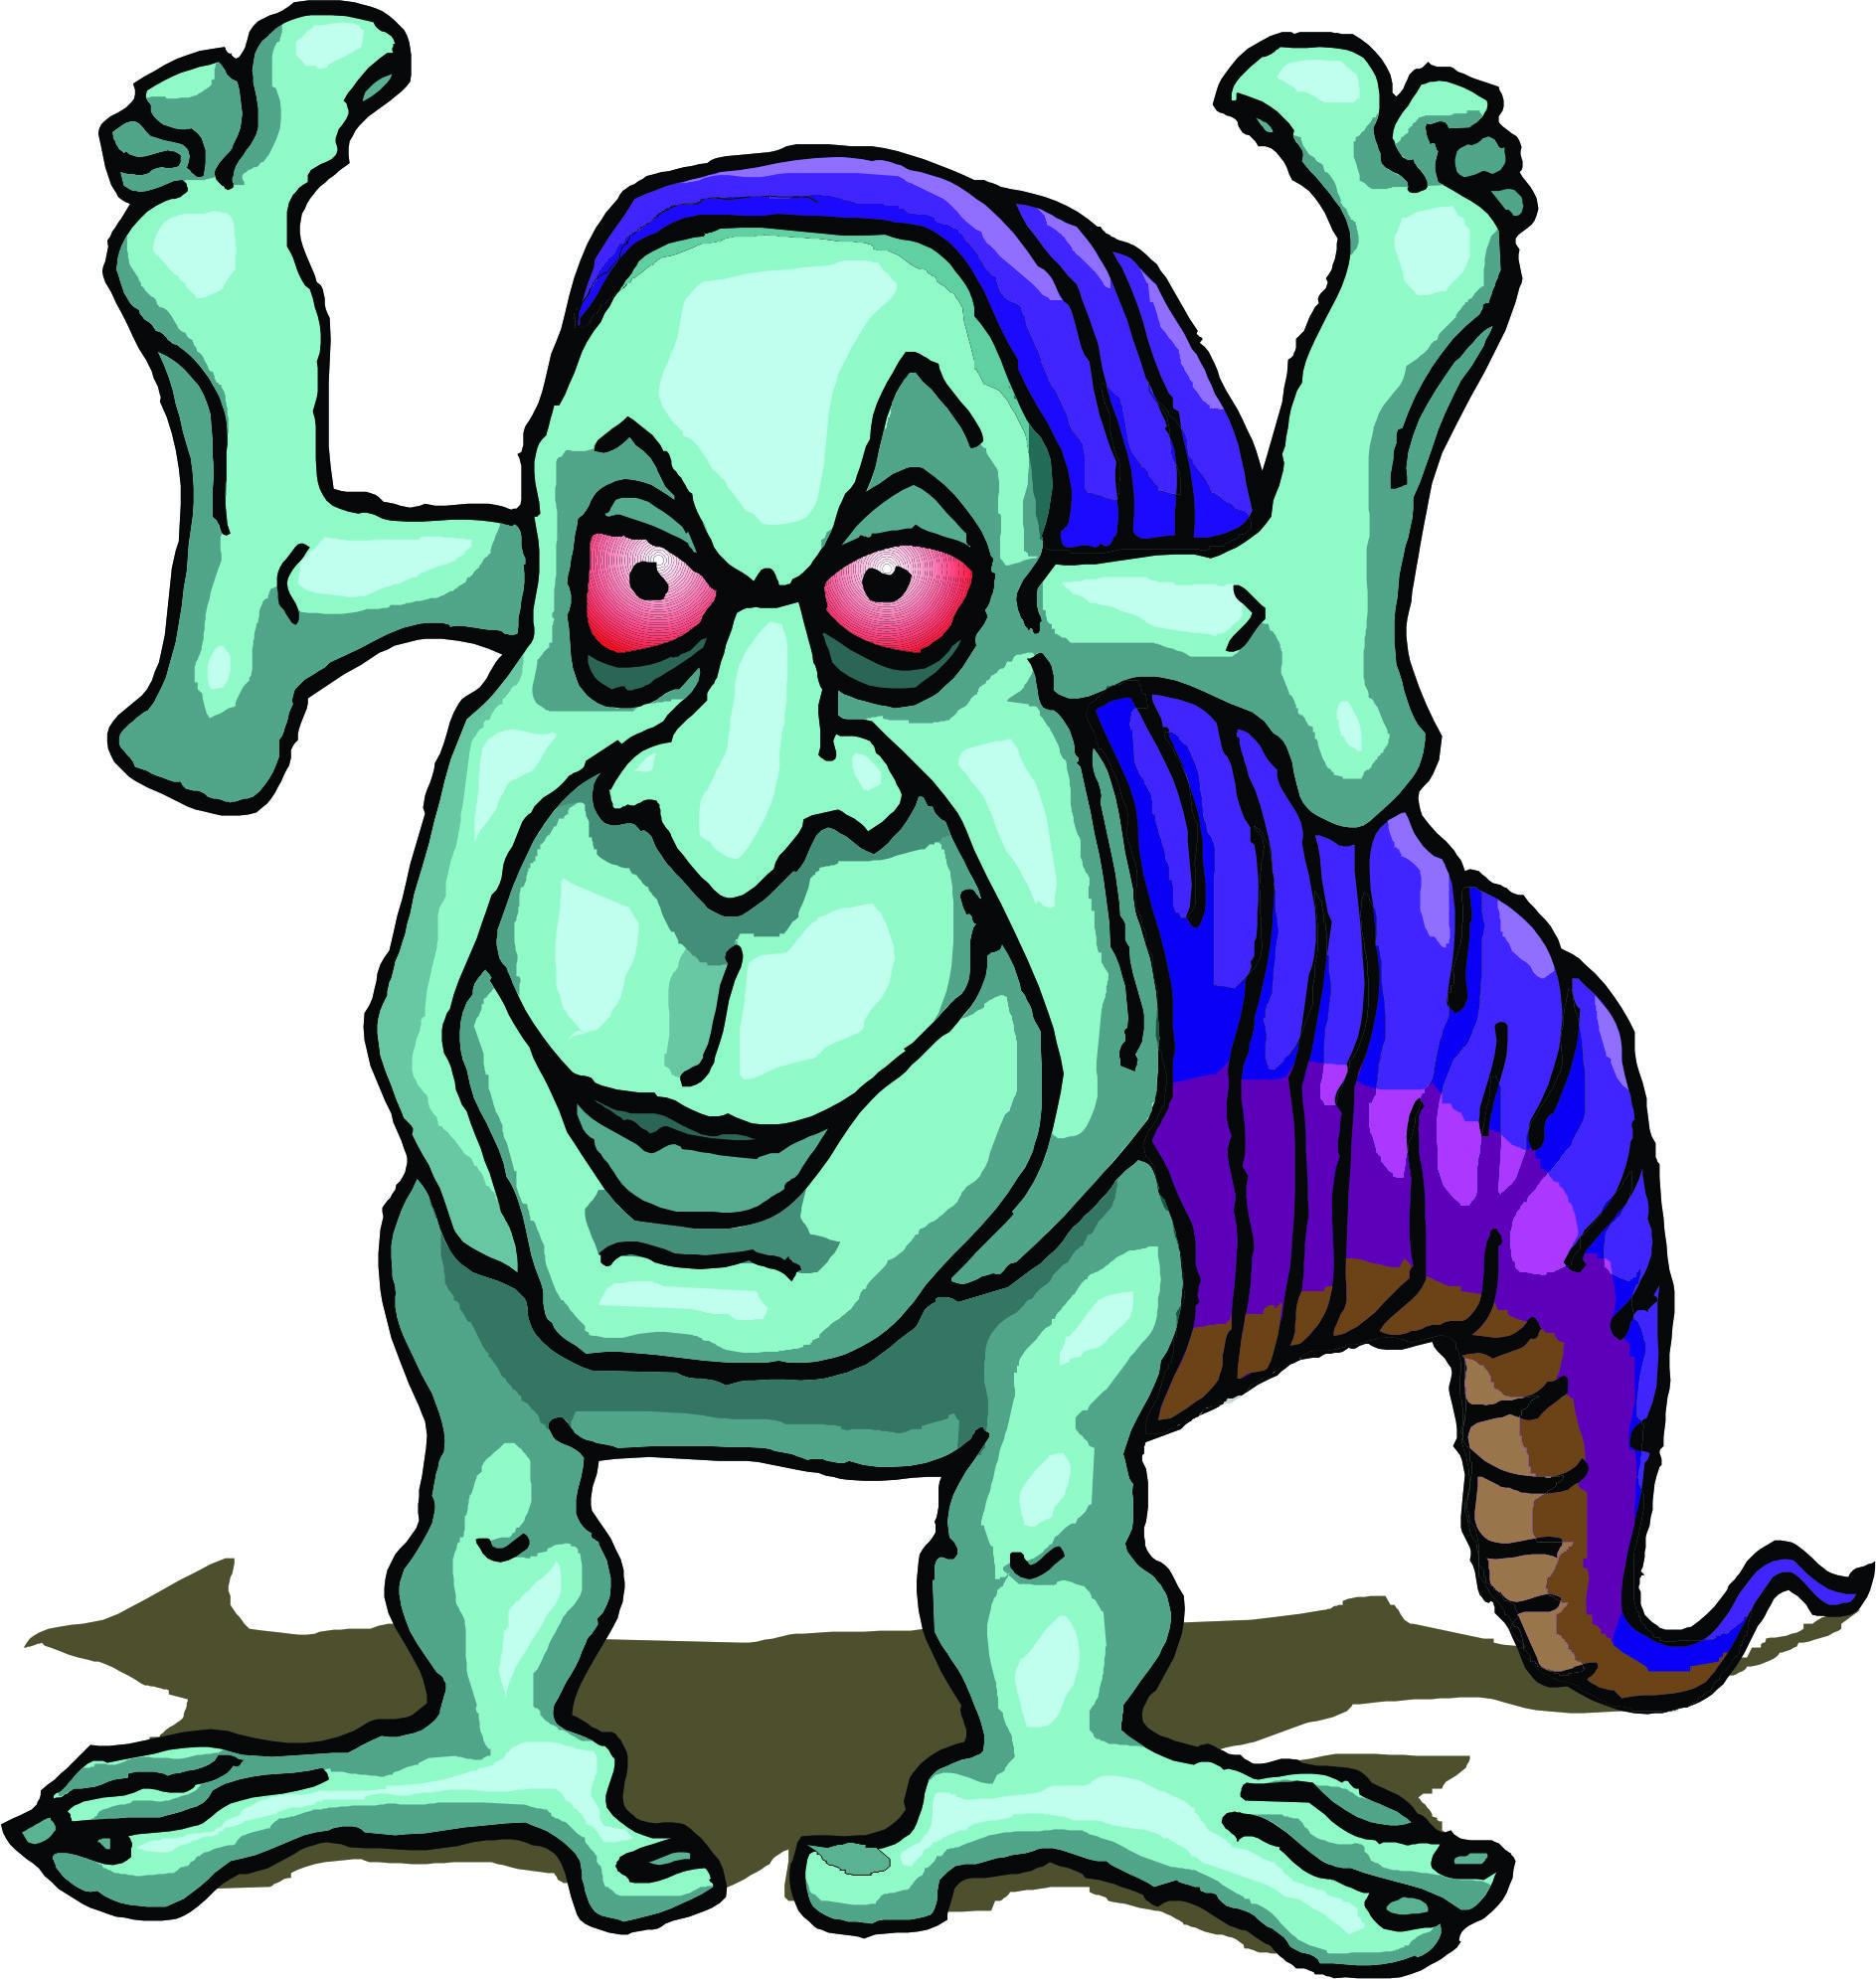 Weird Gnome Mascot